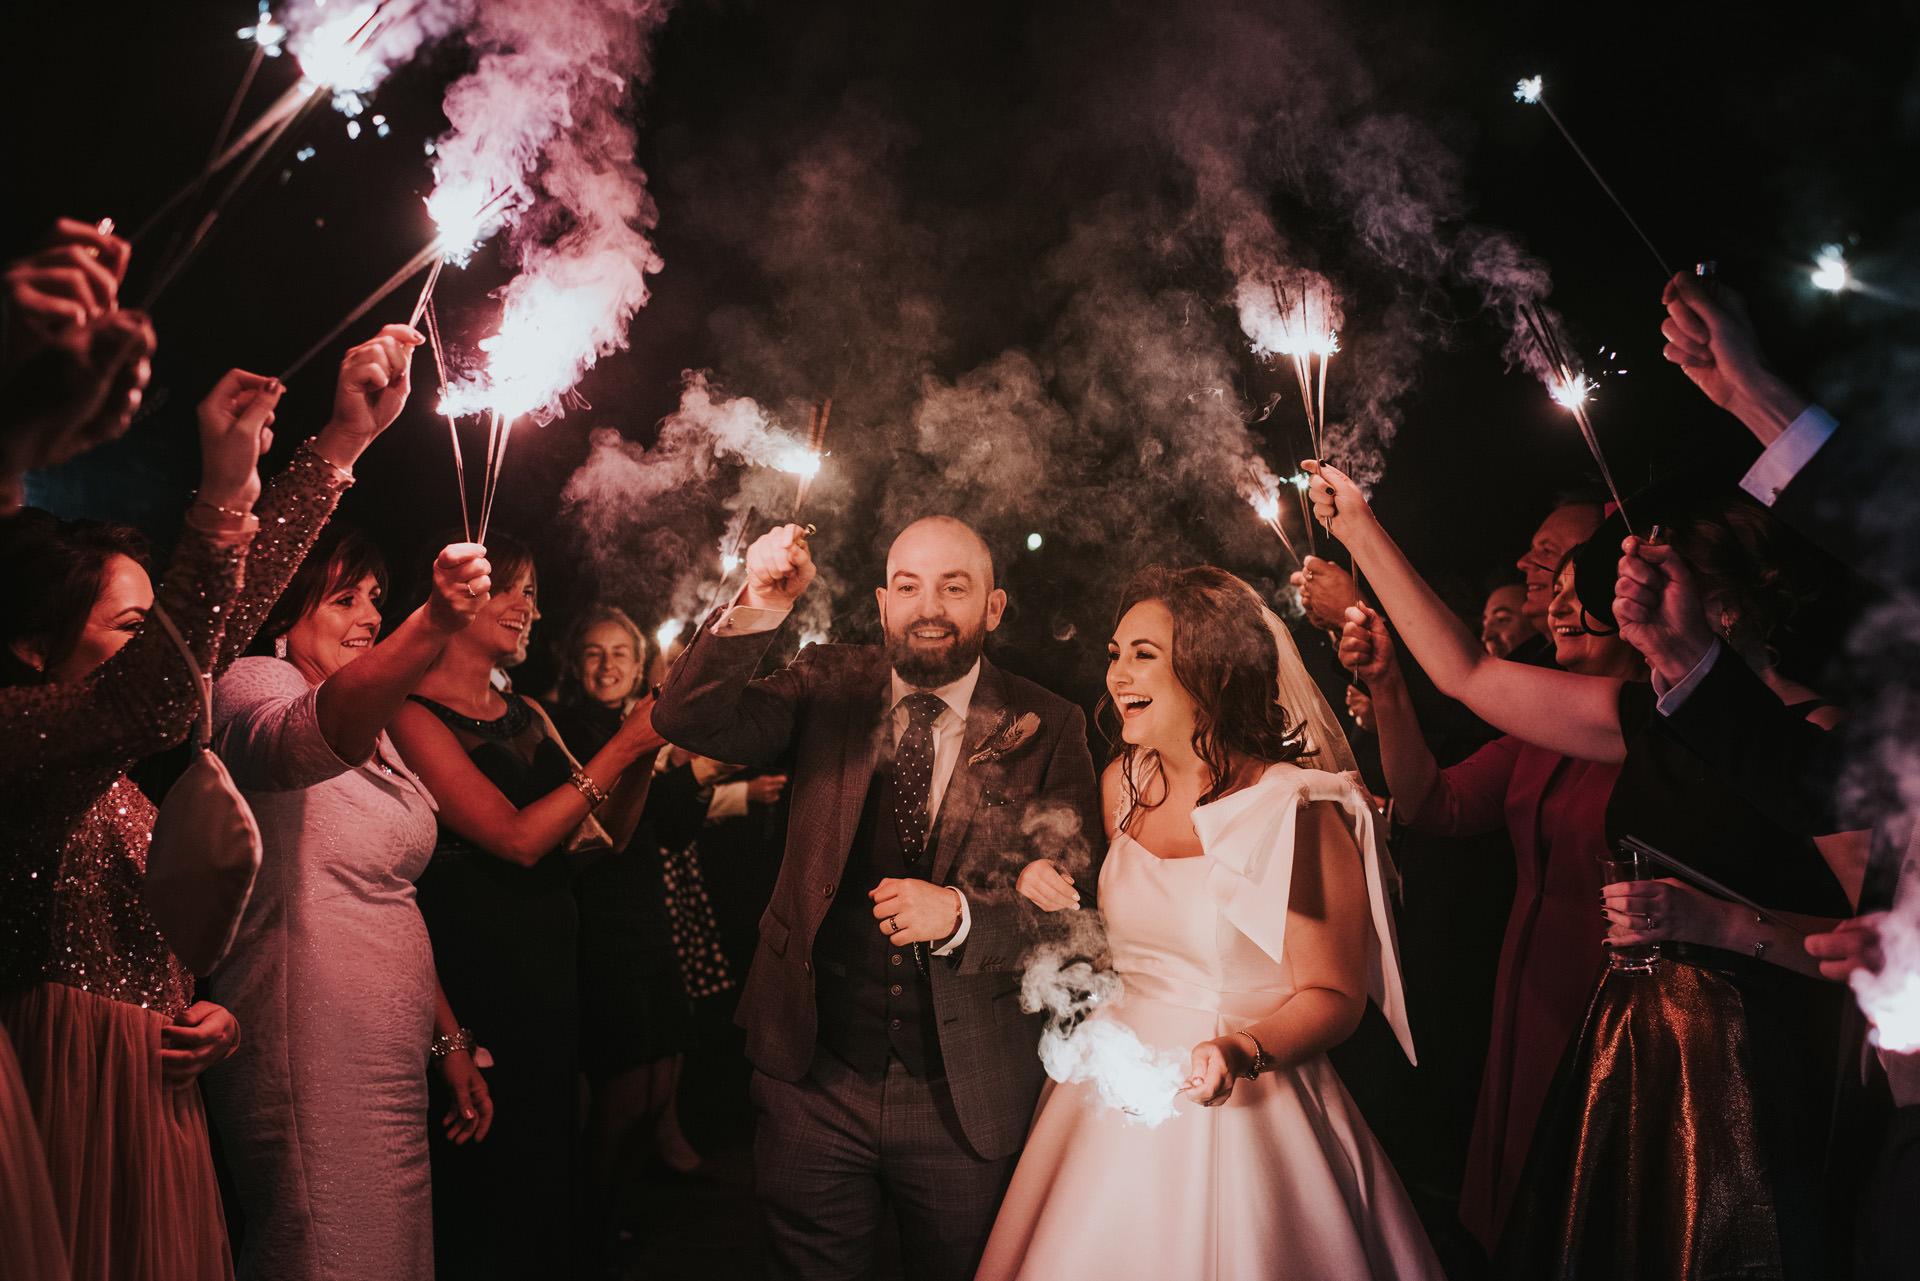 sparklers night shot at the wedding at ballymagarvey village